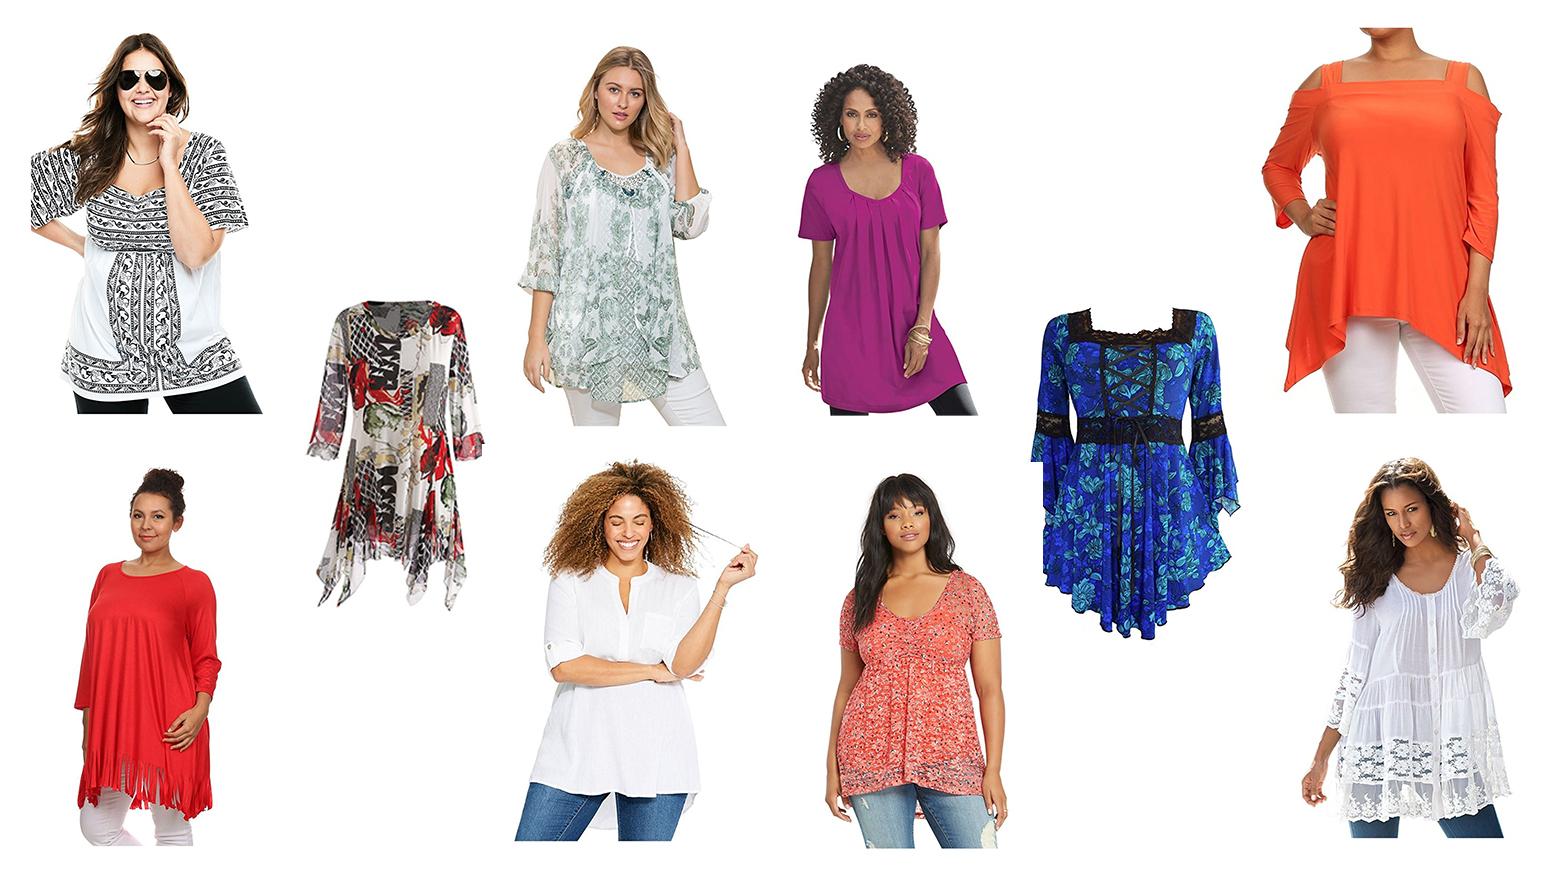 plus size tunics, plus size tops, plus size fashion, plus size clothing